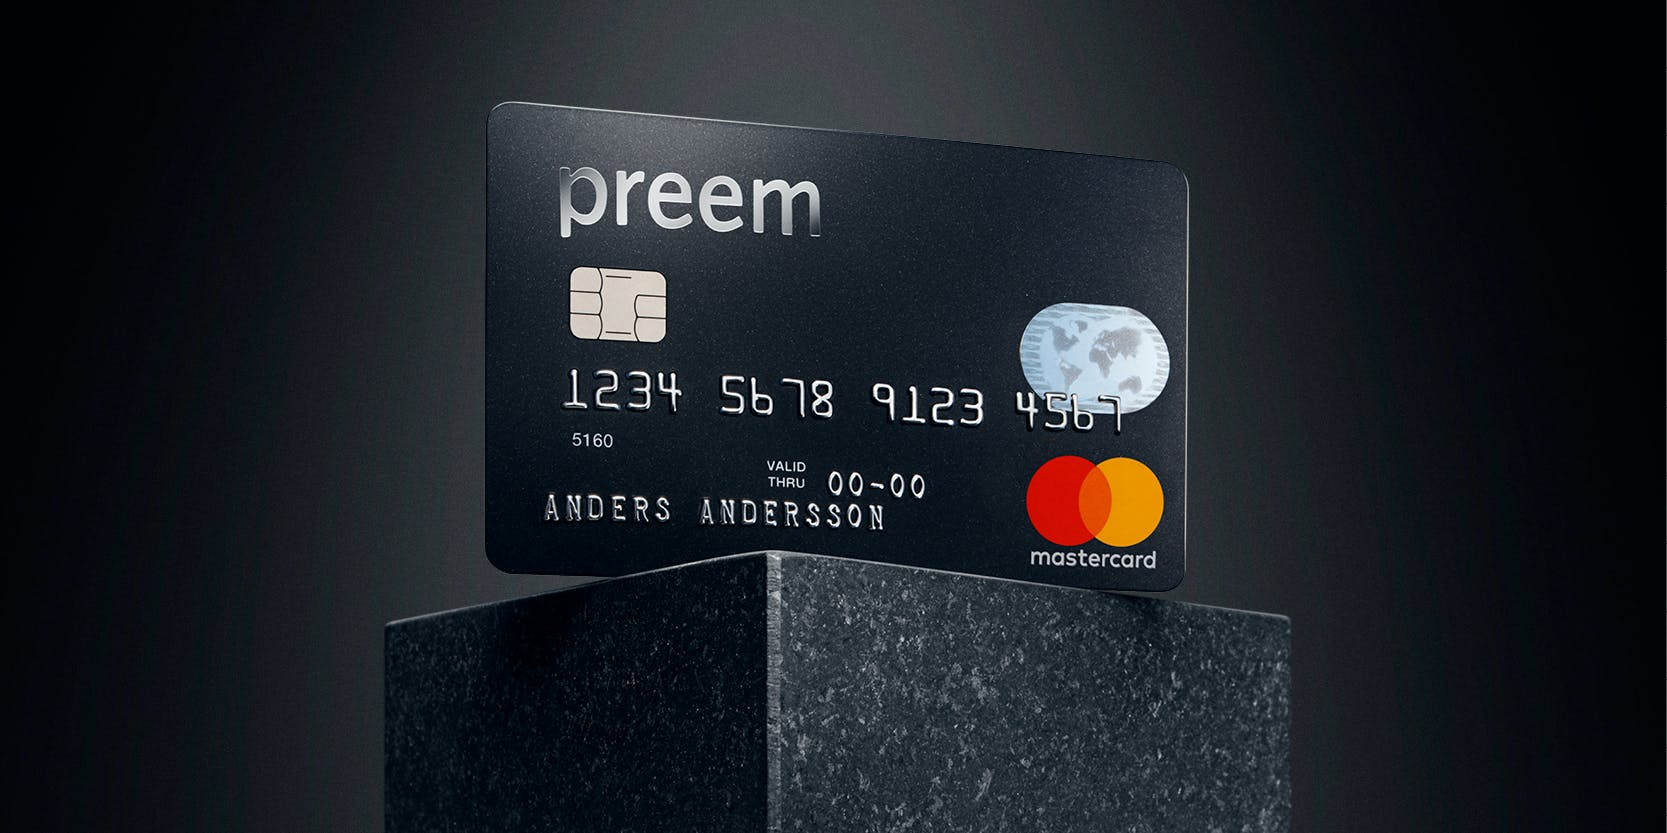 Preem Mastercard kreditkortet